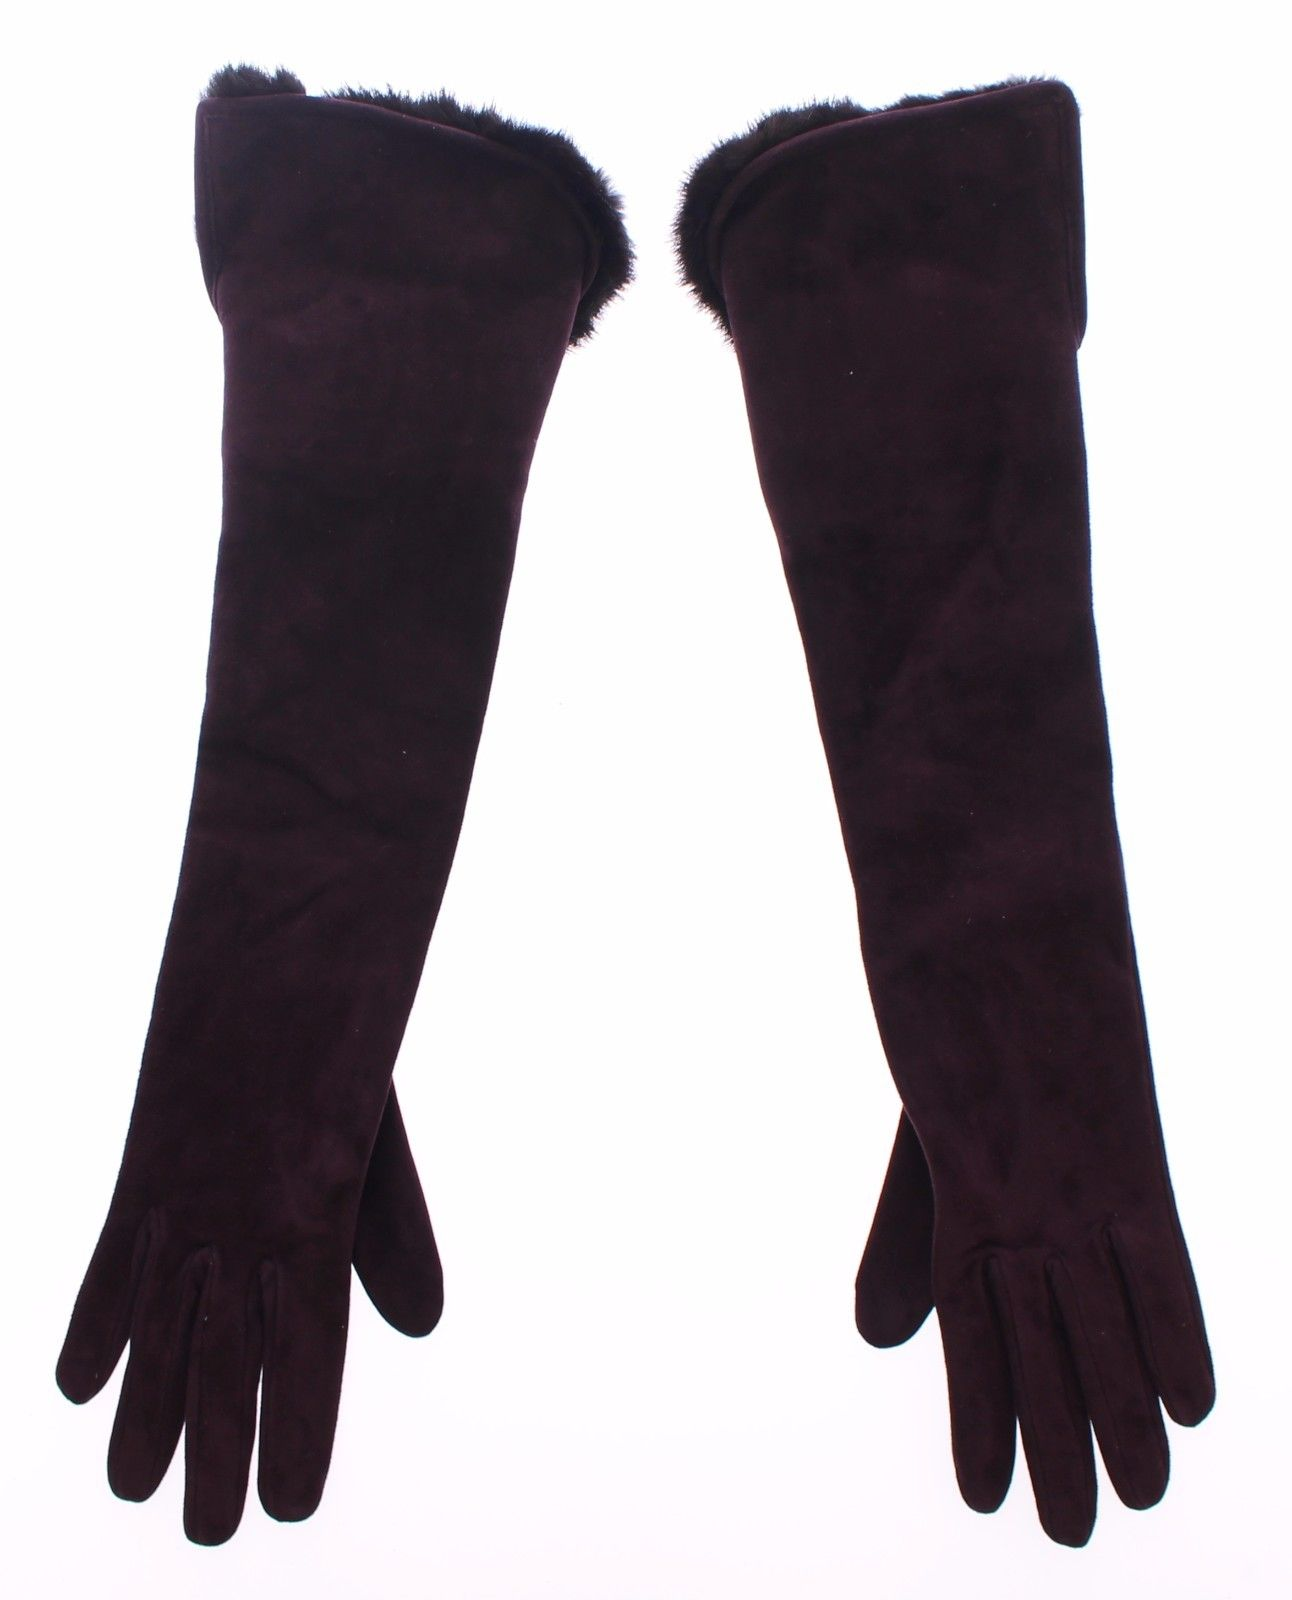 Dolce & Gabbana Women's Mink Fur Goatskin Suede Leather Gloves Purple MOM11456 - 7.5 | M